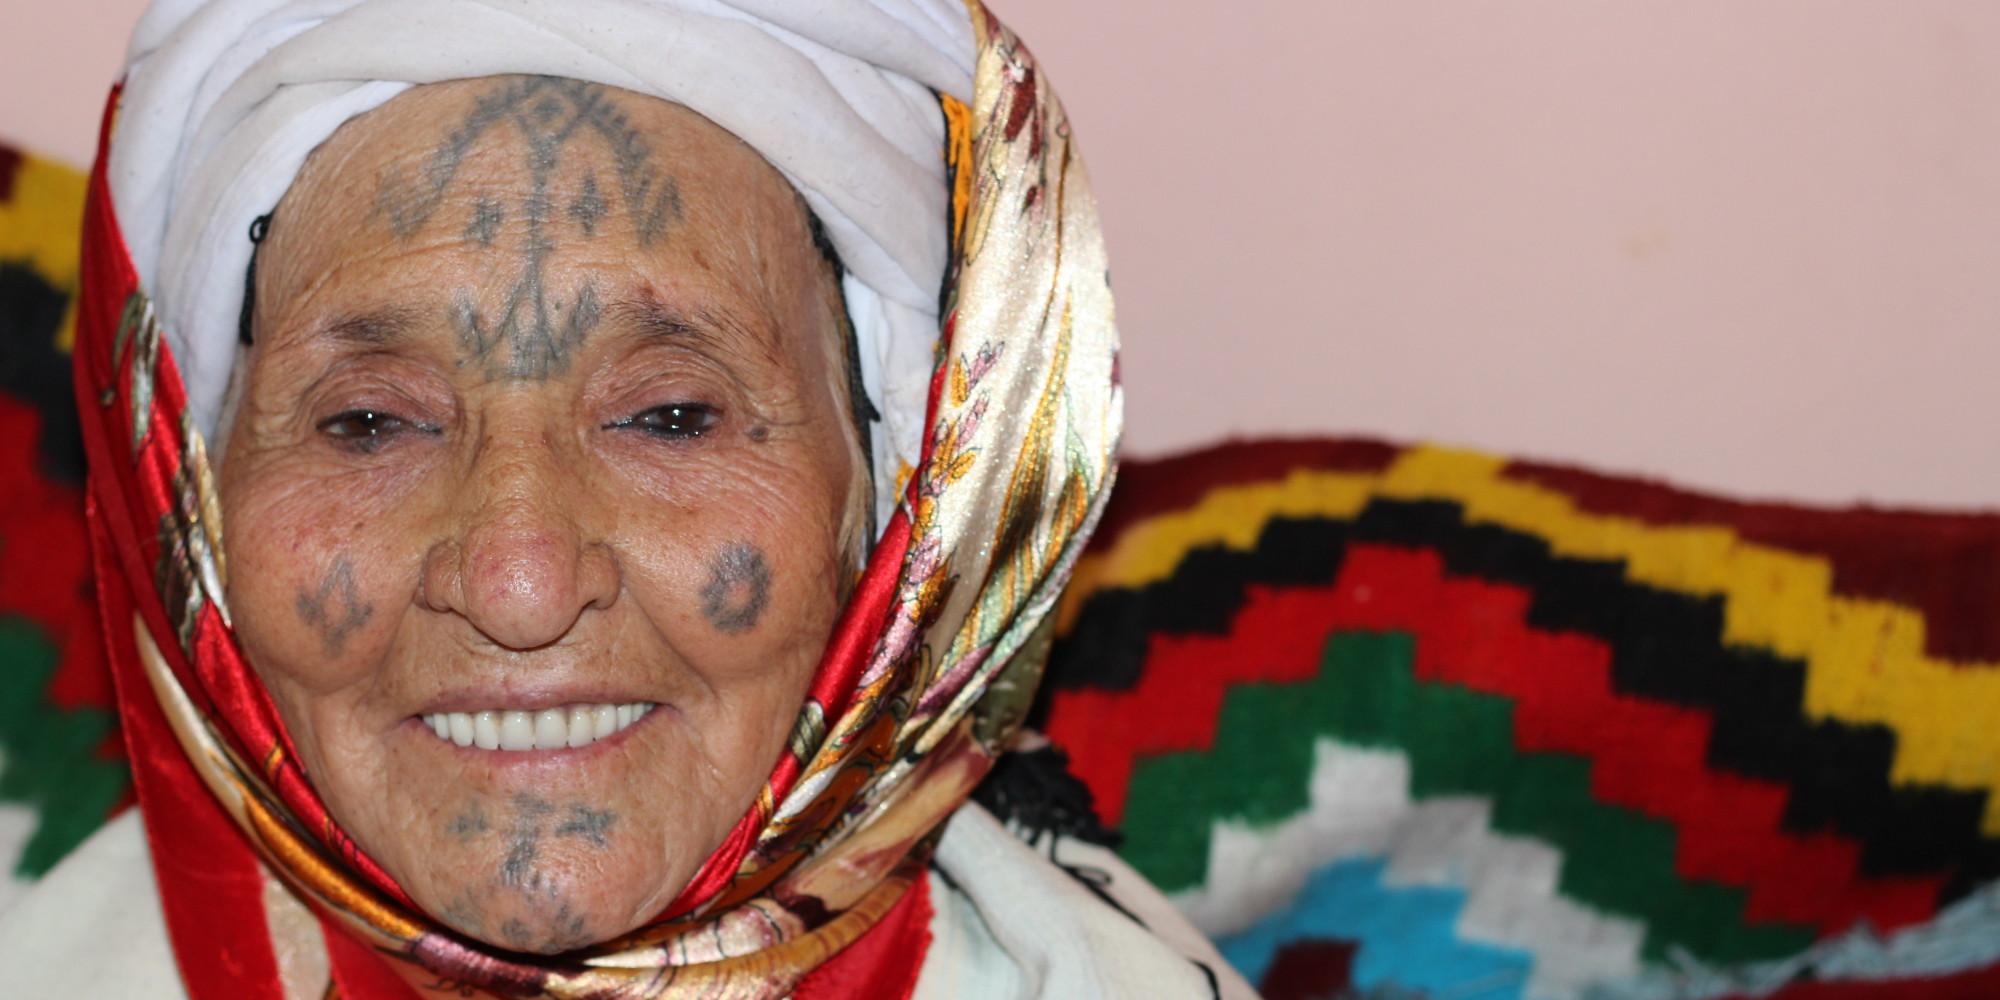 Cherche femme algerien au canada